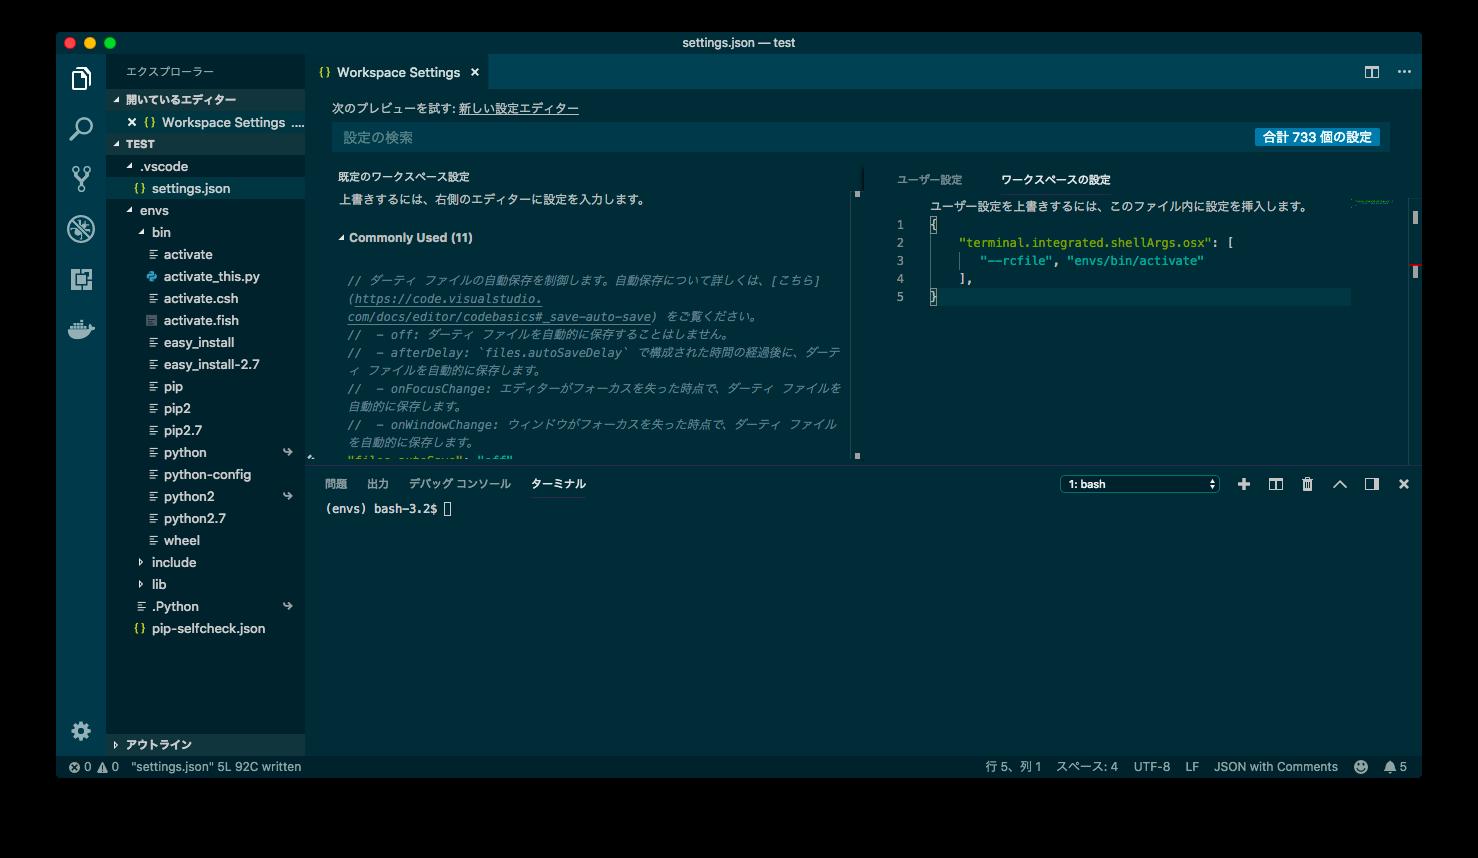 vscode tips 統合ターミナル開始時に python 仮想環境 venv に入る 2